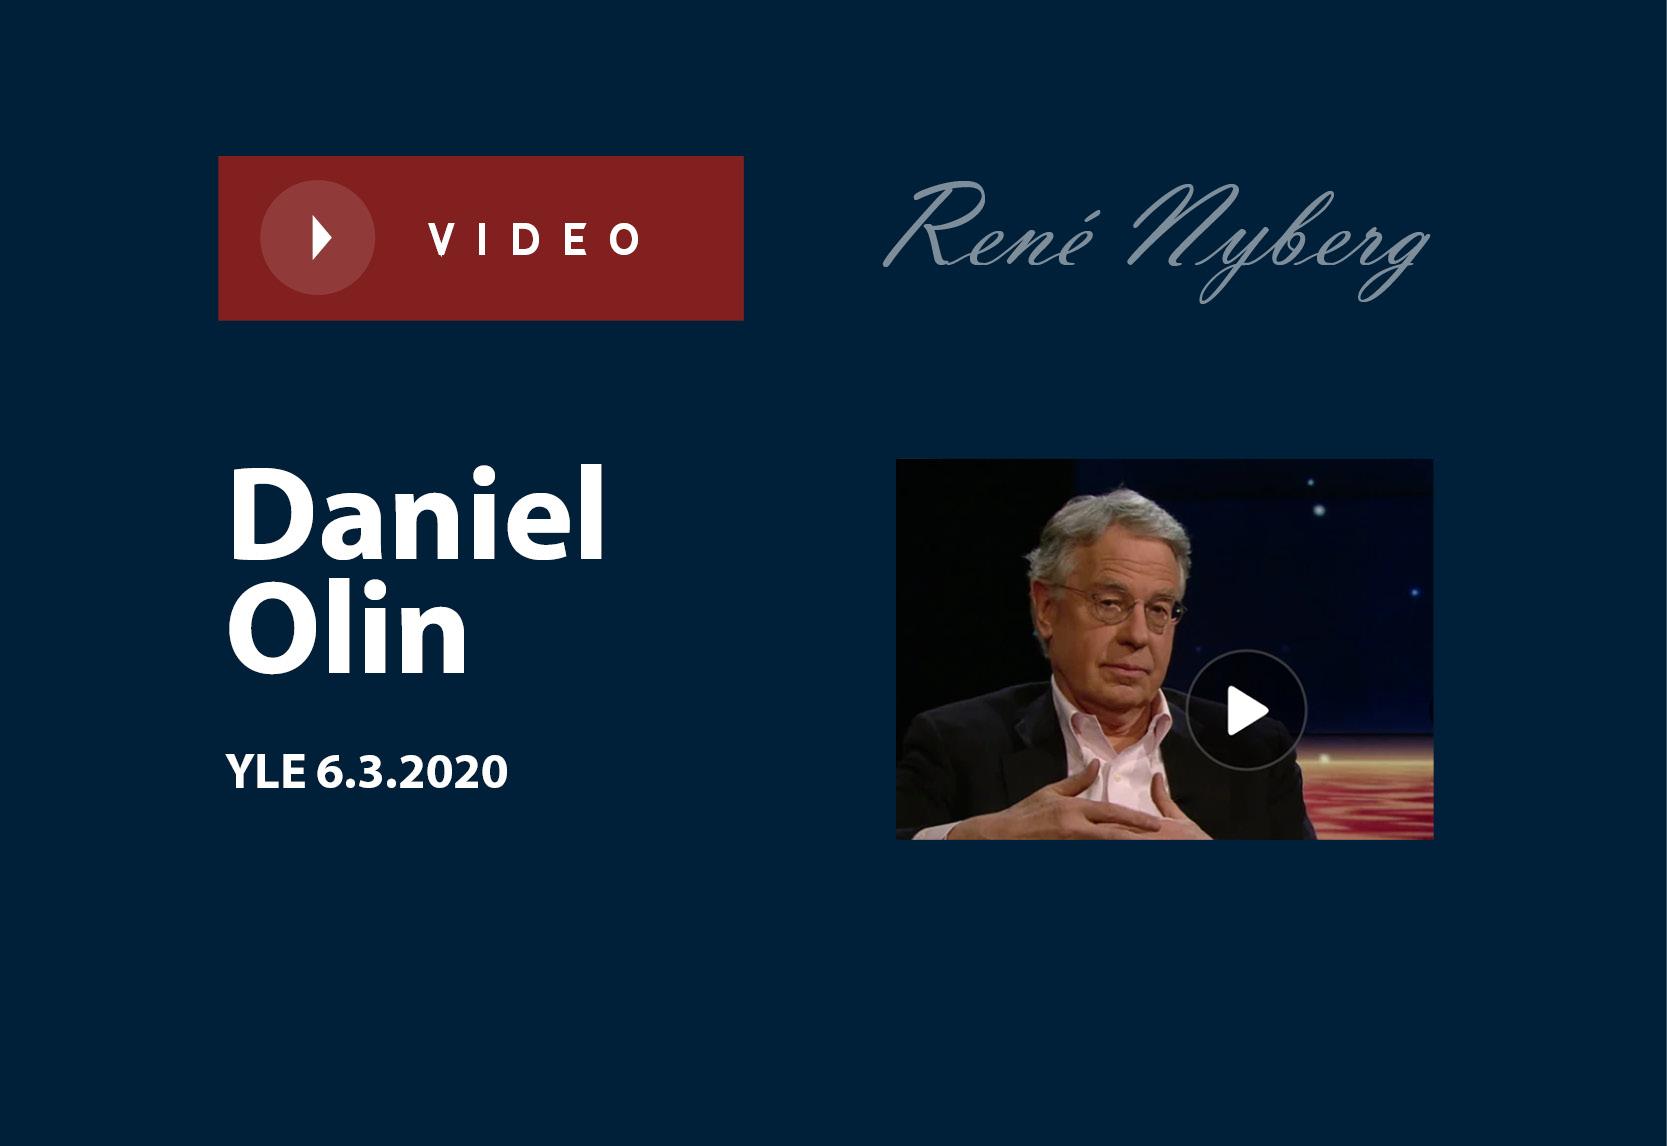 Daniel Olin 6.3.2020